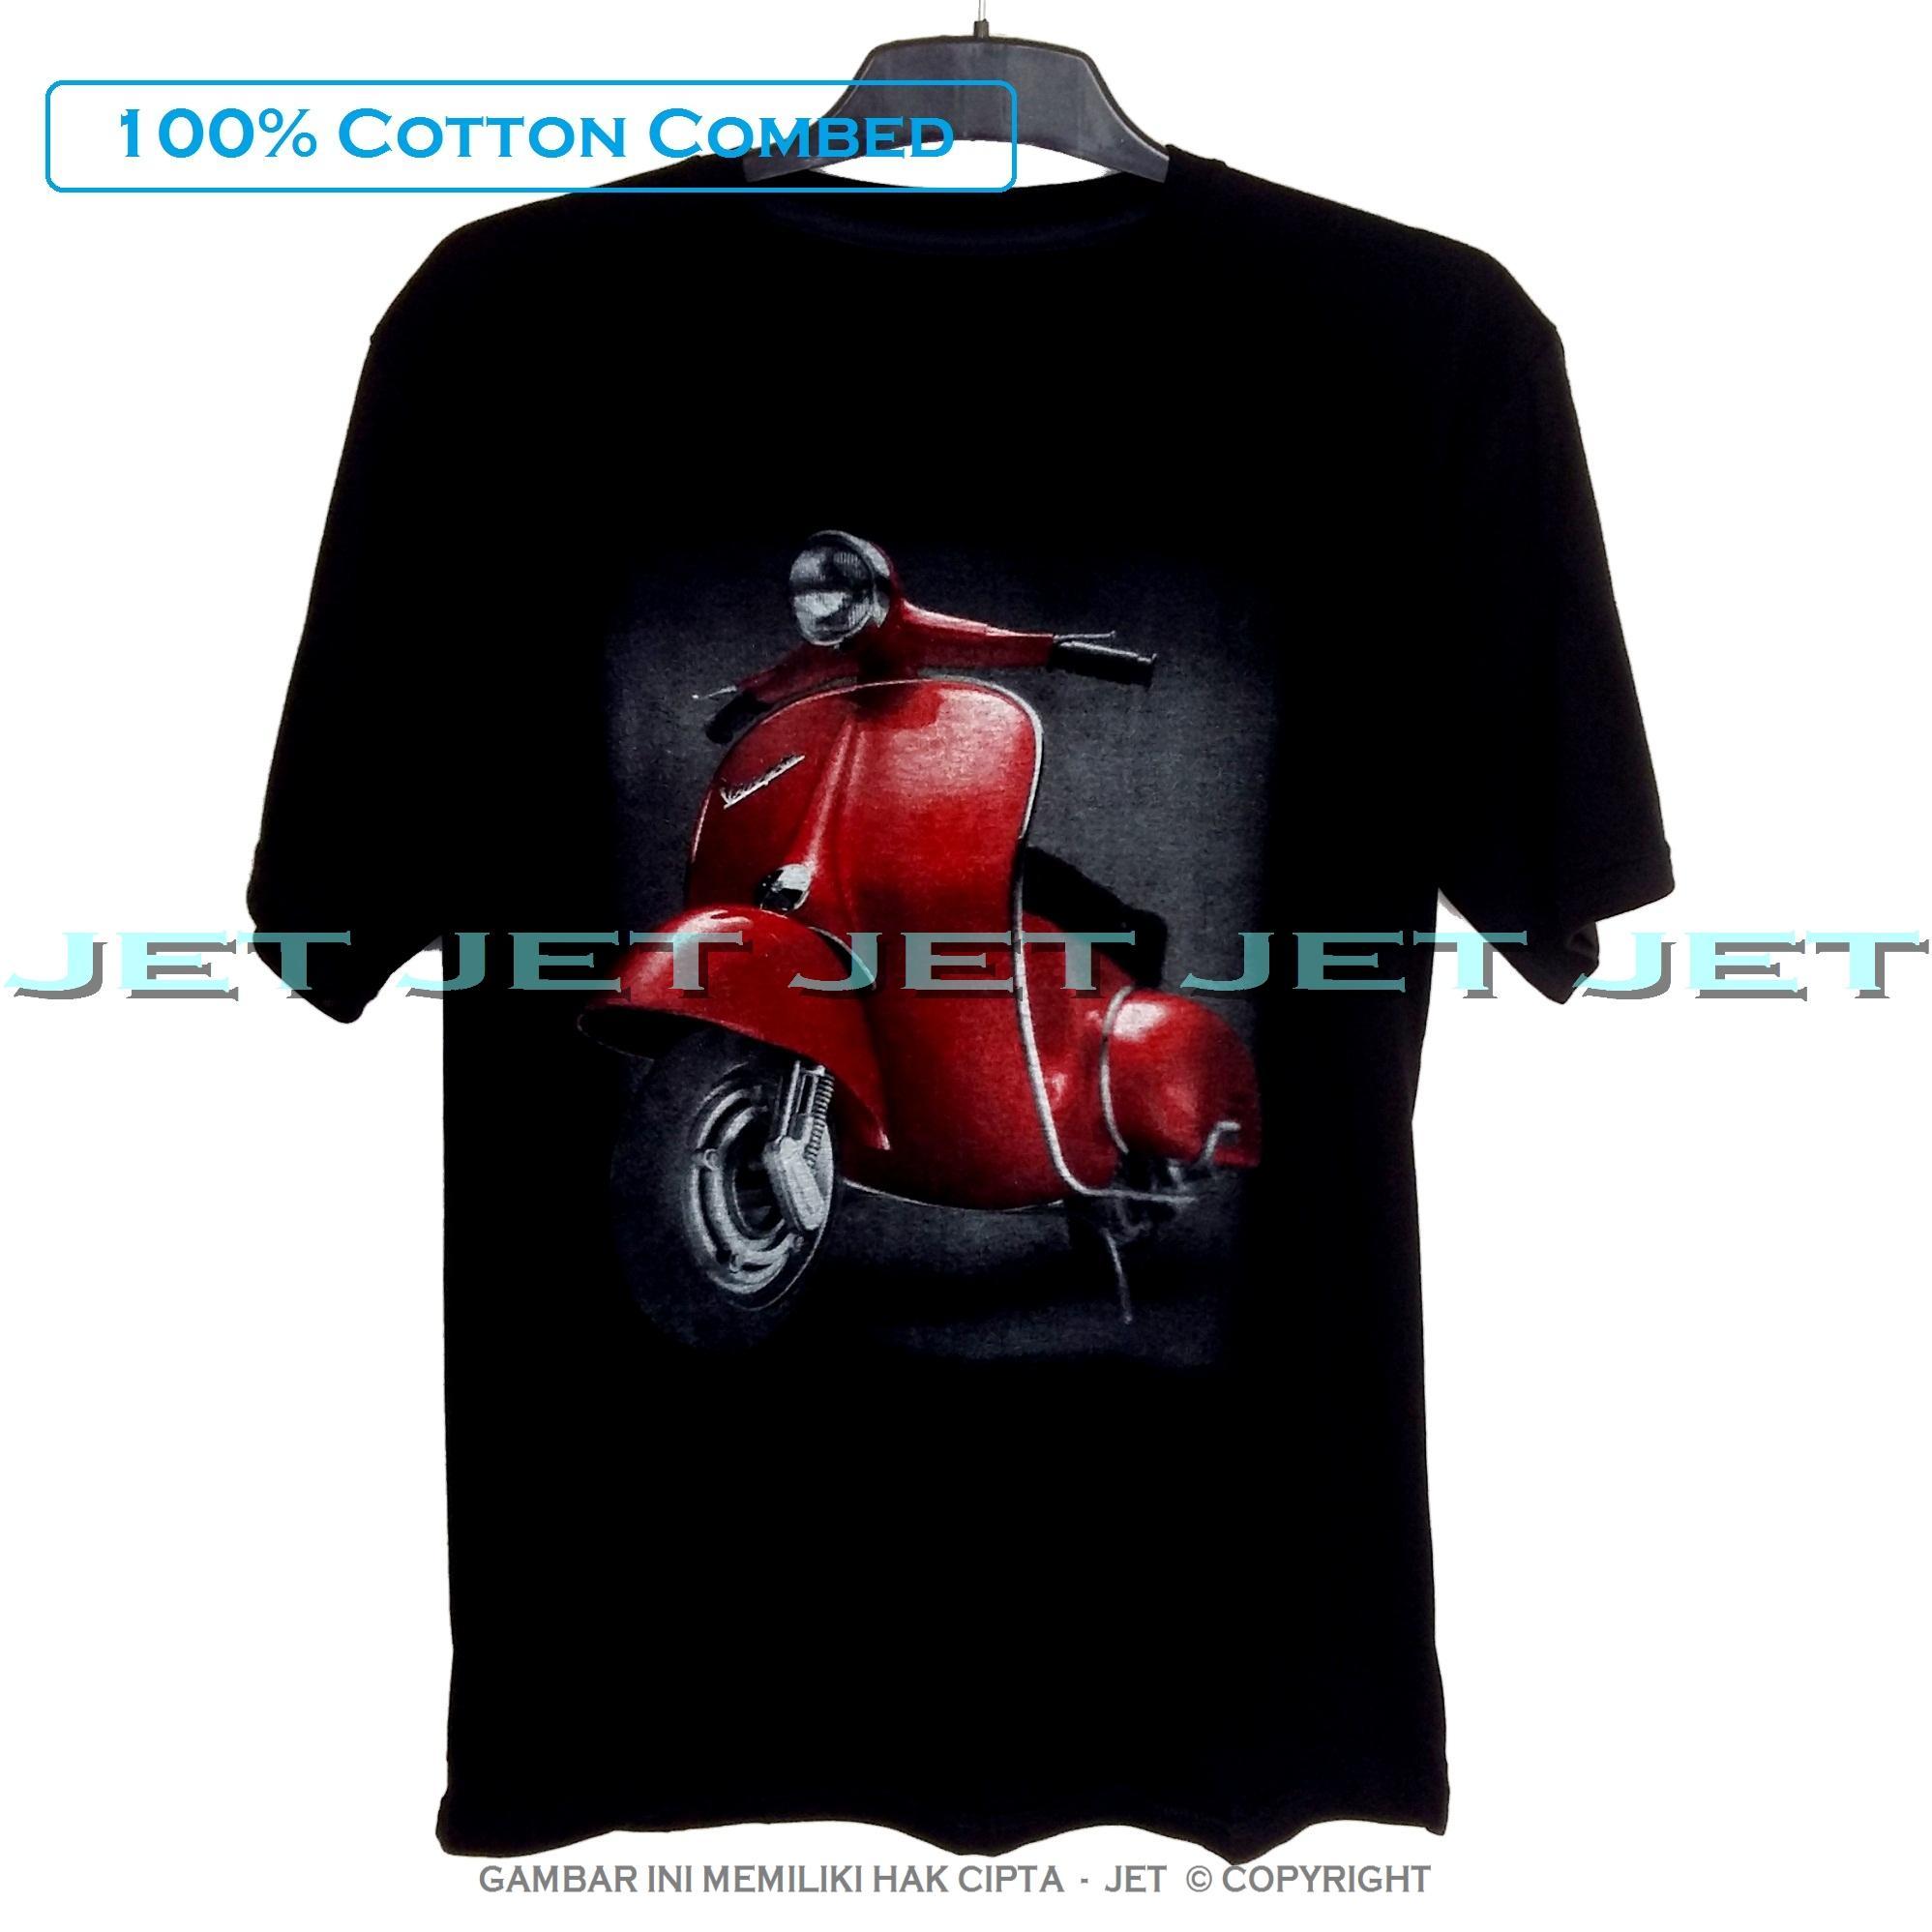 JeT - Black T-Shirt Premium Cotton Combed Motor Vespa Merah